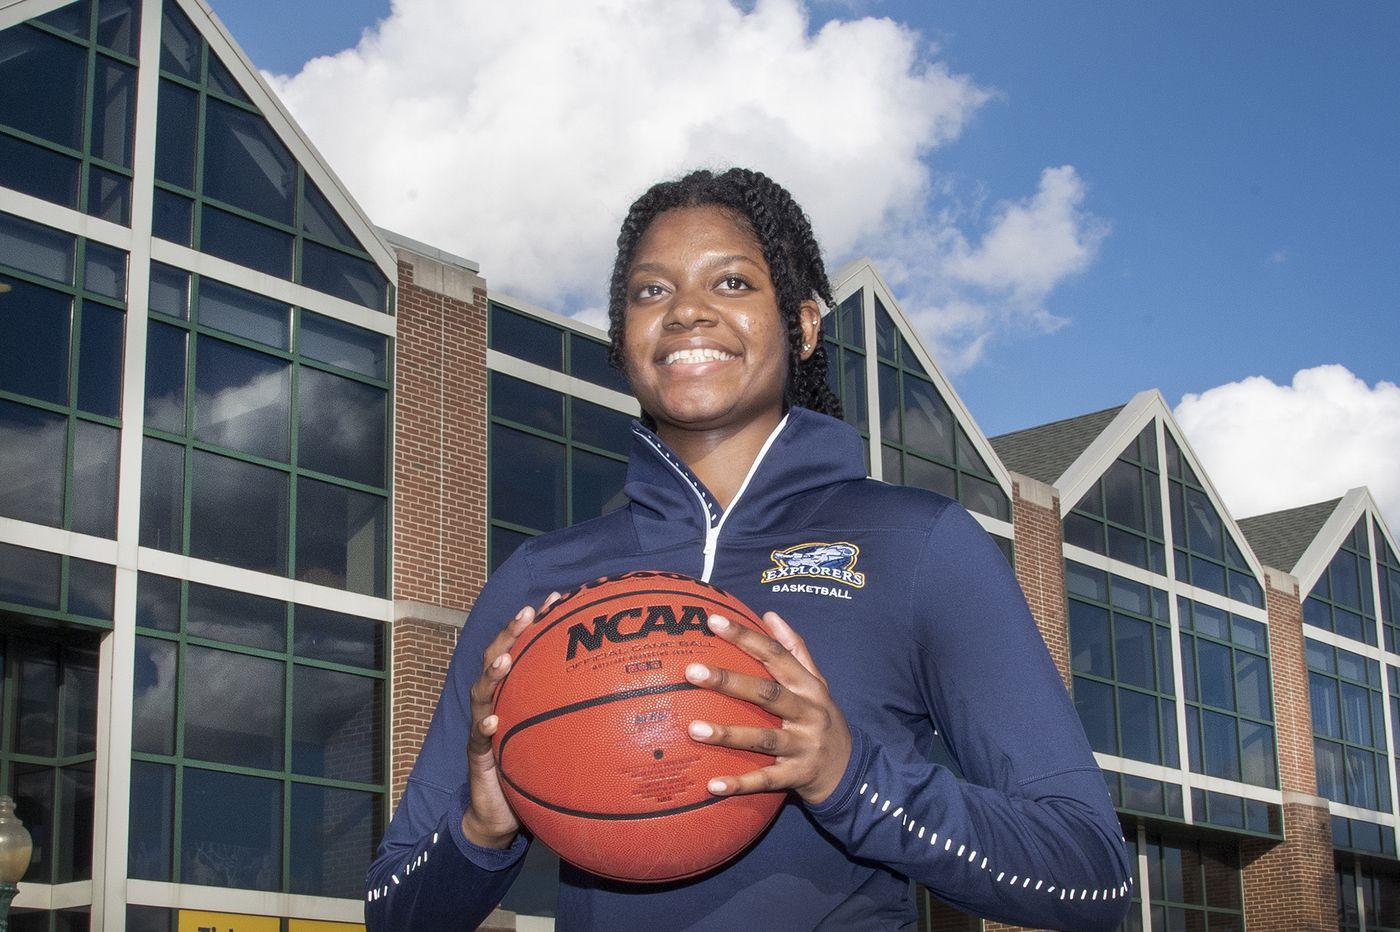 La Salle's Kayla Spruill and her big jump | City 6 profile